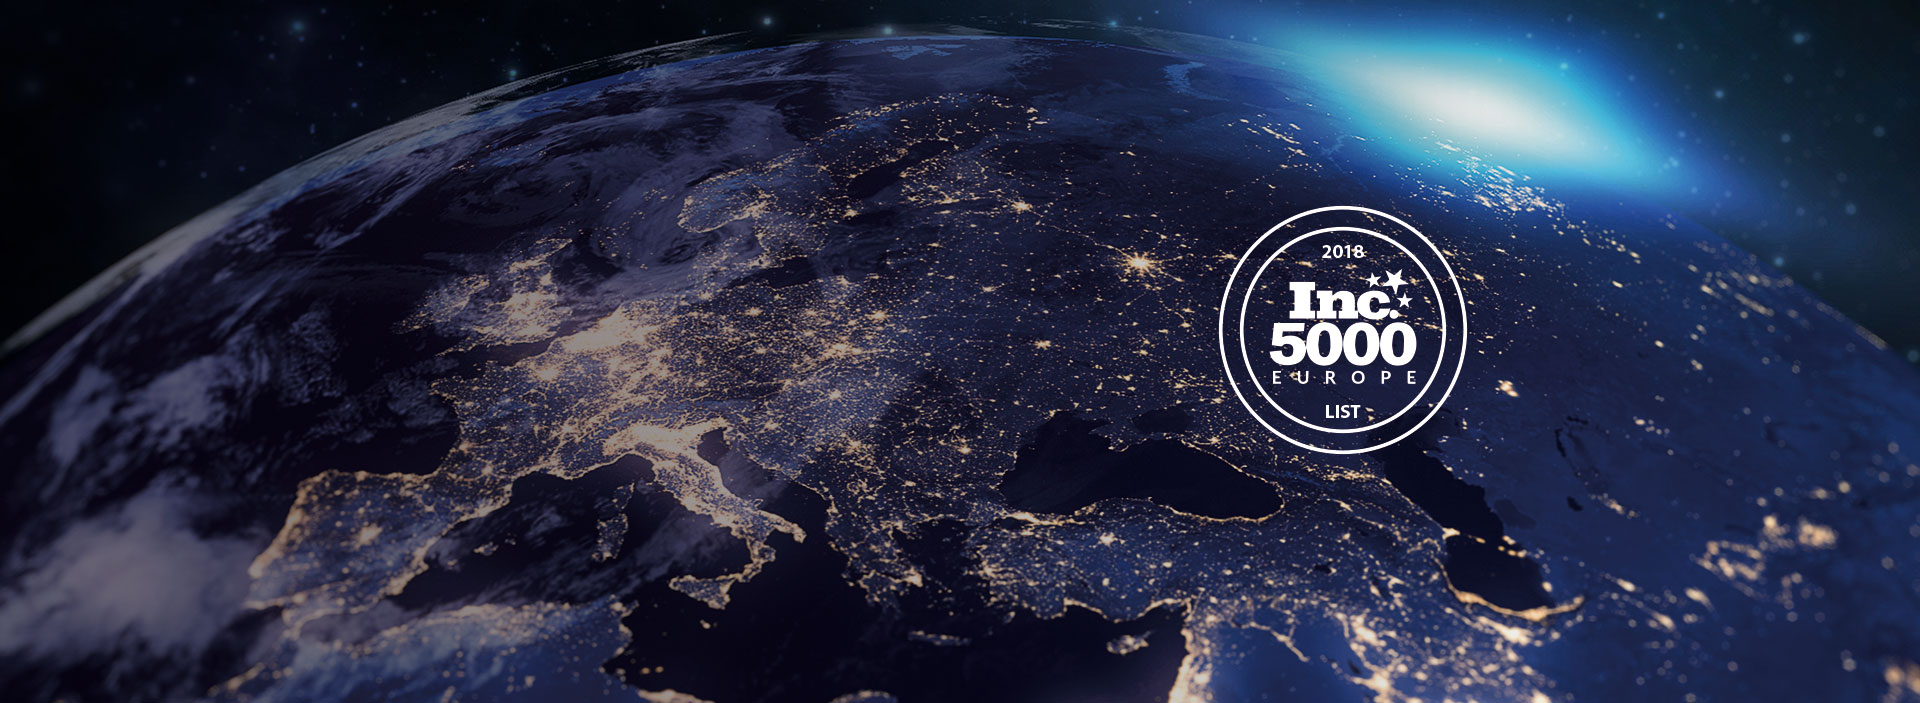 N-iX Enters the 2018 Inc. 5000 Europe List